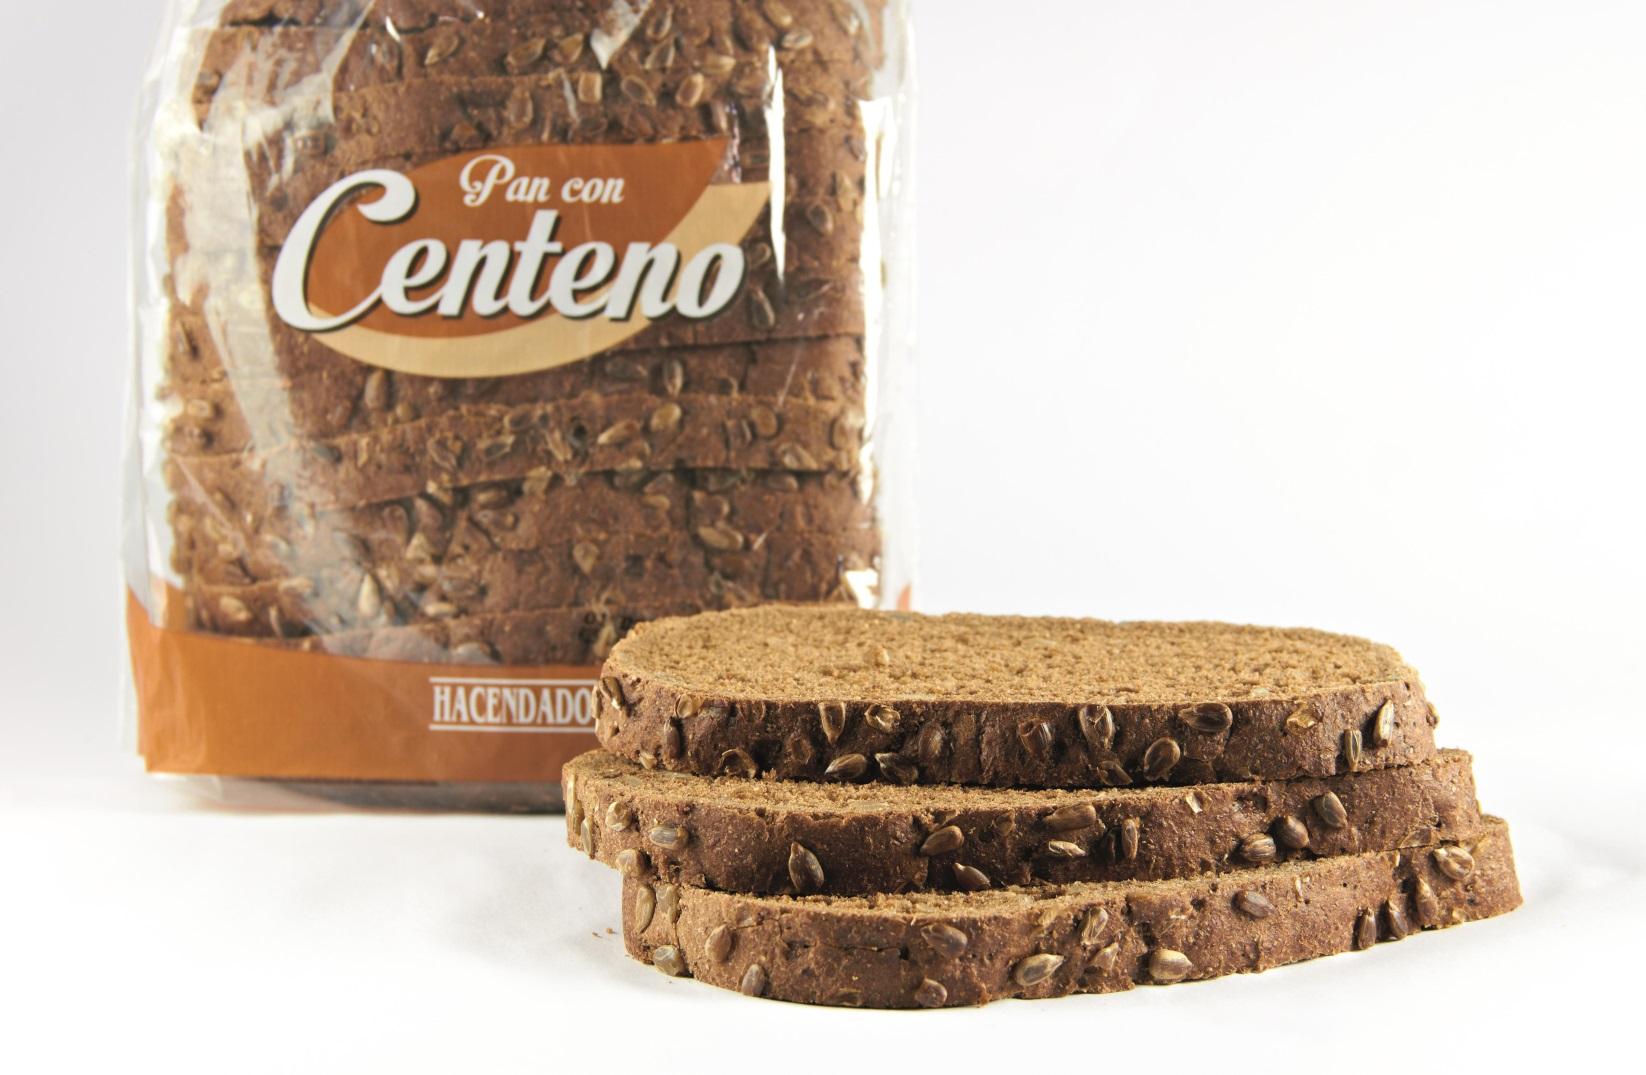 Resultado de imagen de pan con centeno mercadona